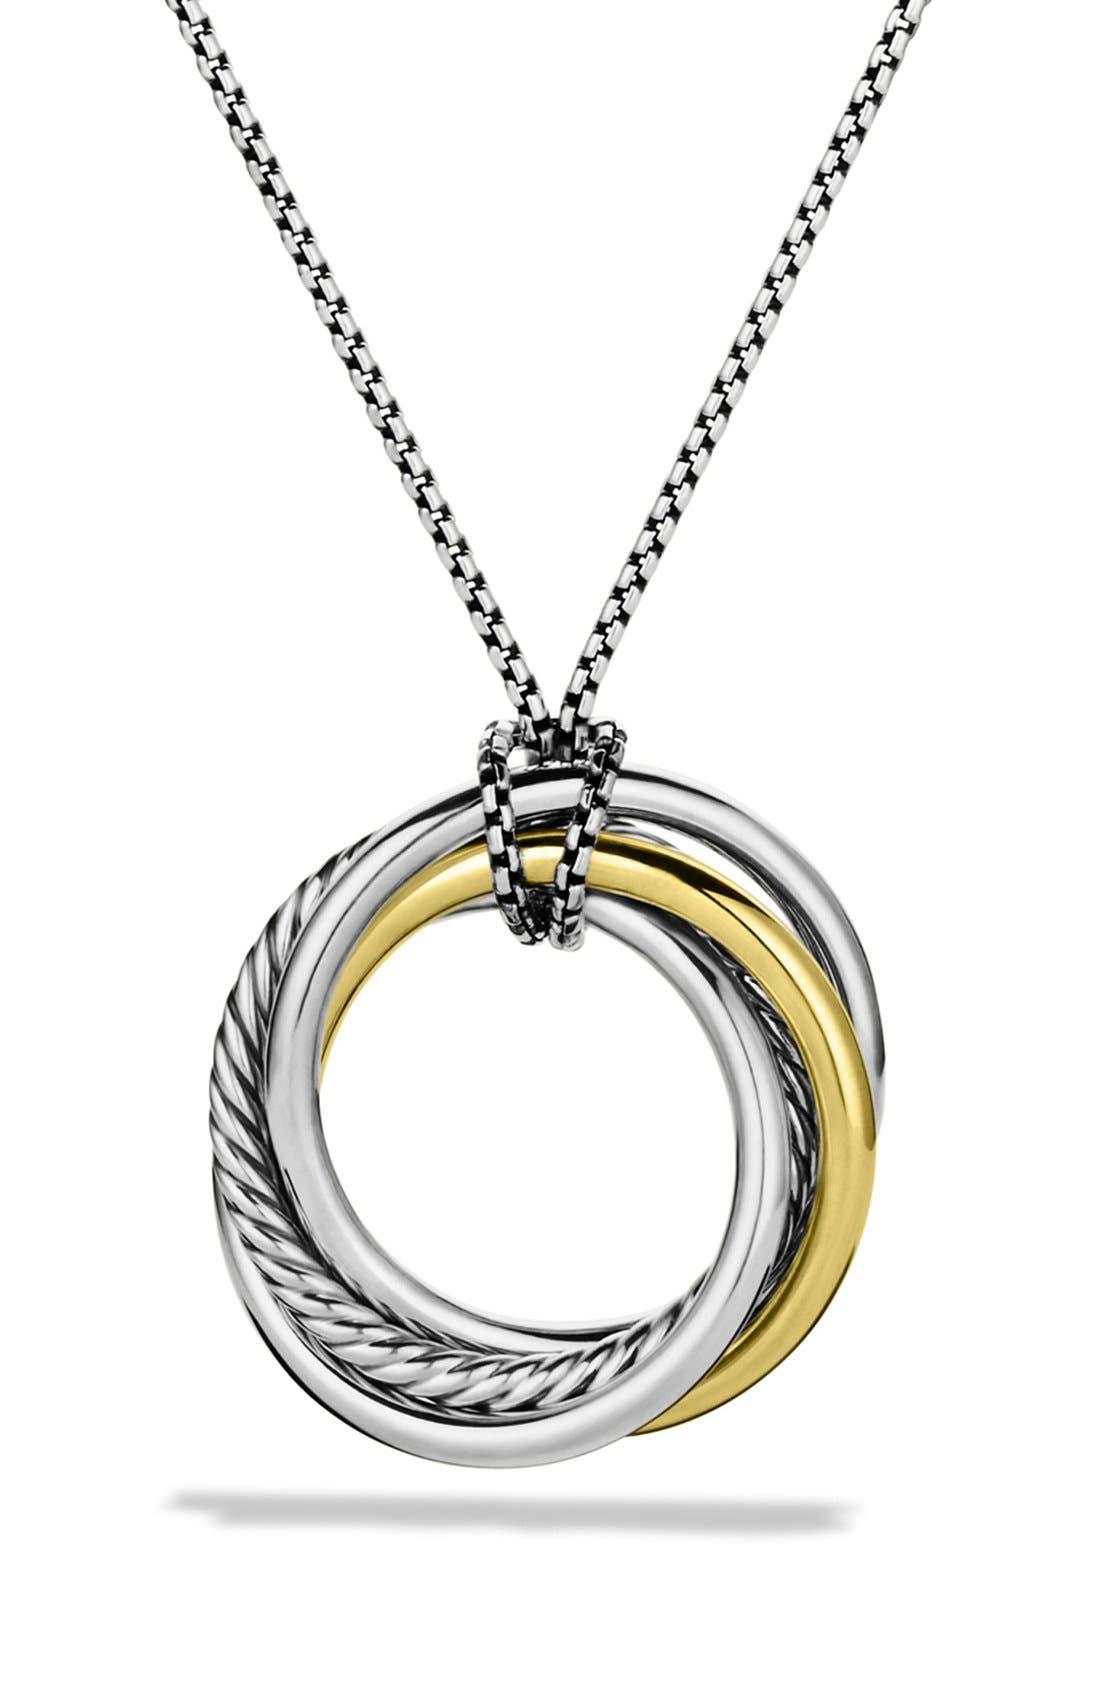 Main Image - David Yurman 'Crossover' Pendant with Gold on Chain